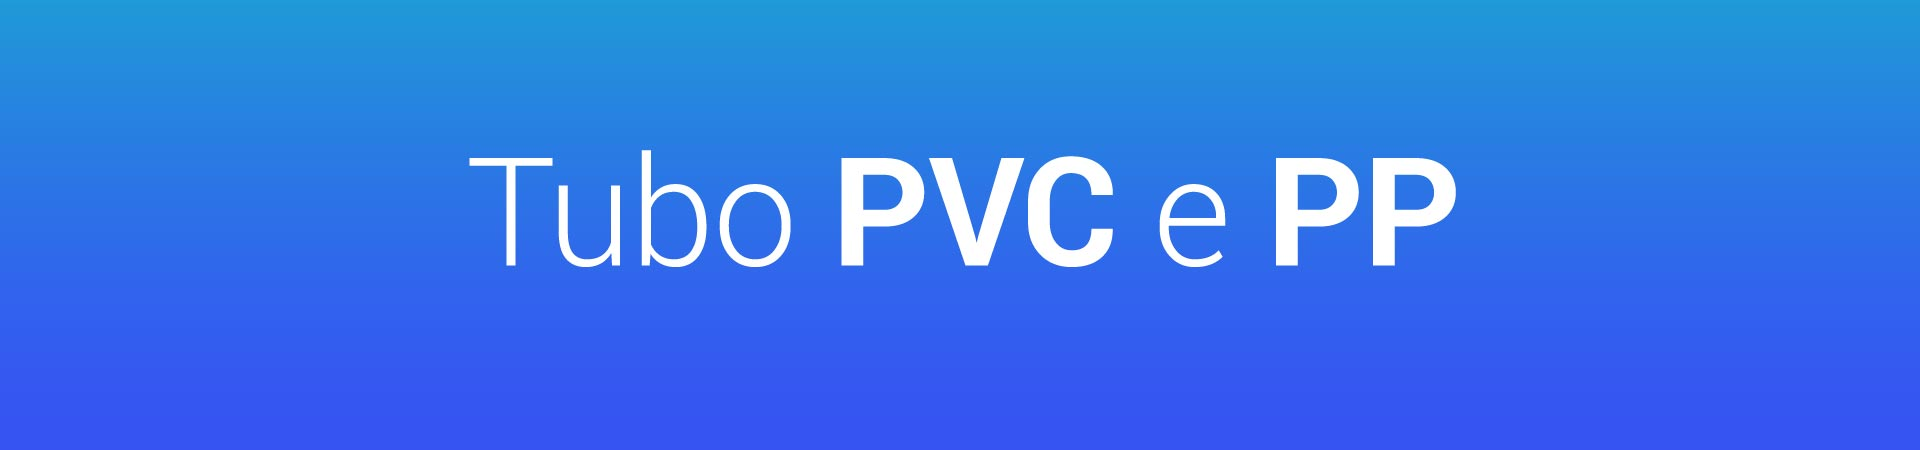 TUBO-Pvc-PP-titolo